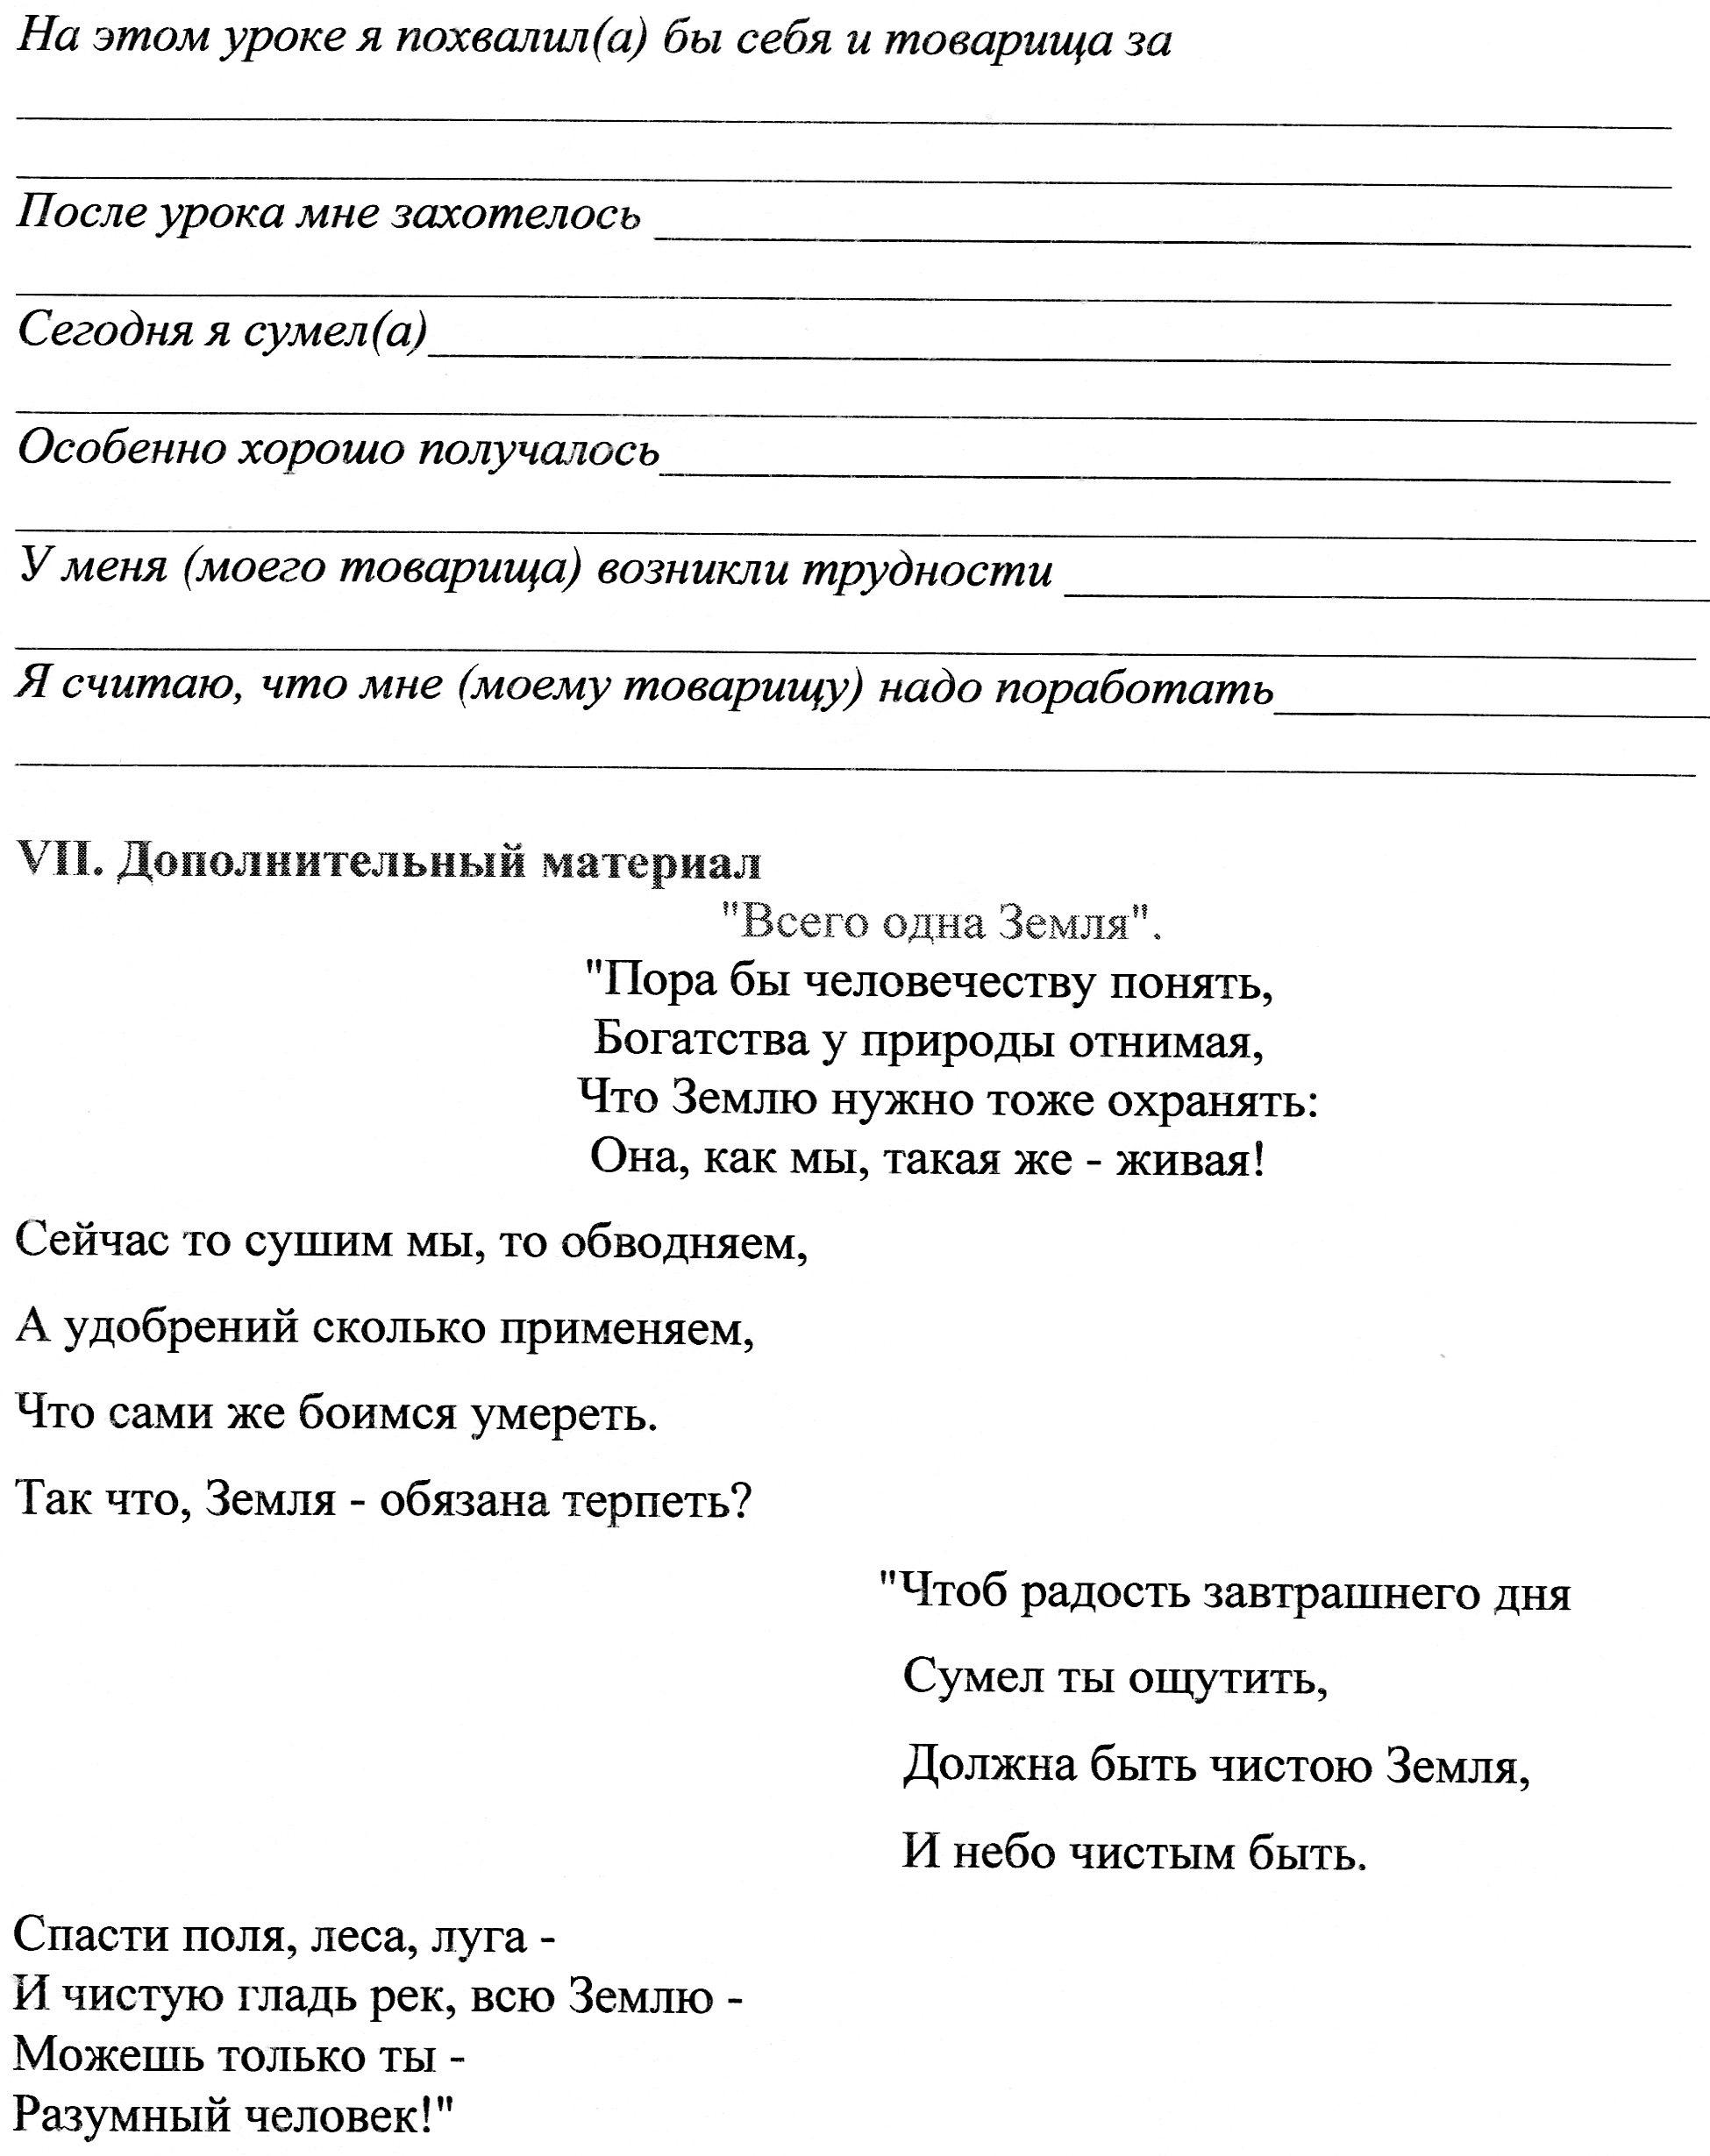 C:\Documents and Settings\Учитель\Мои документы\Мои рисунки\img085.jpg